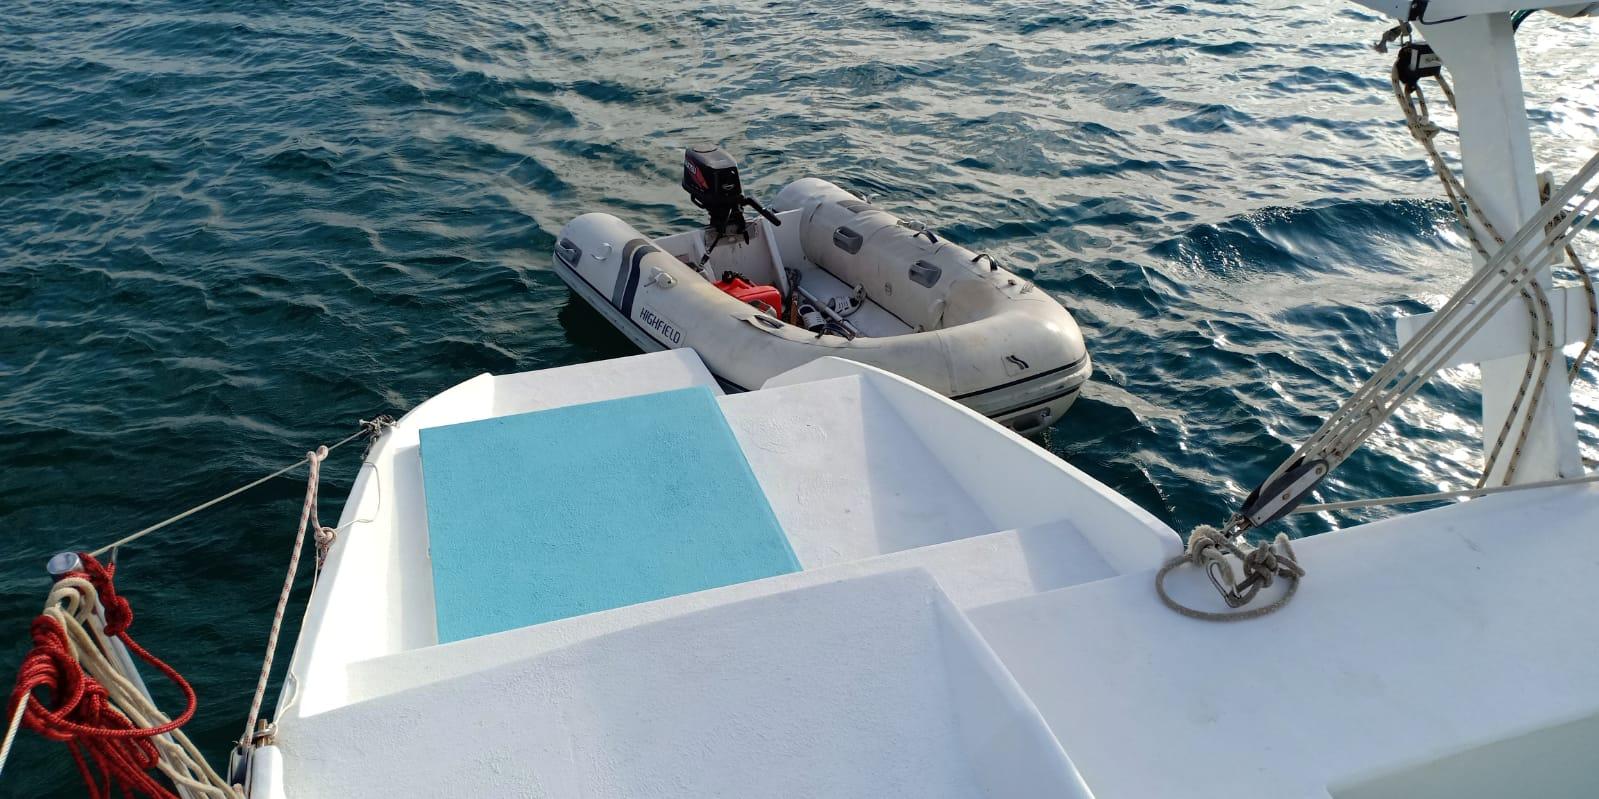 Used Sail Catamaran for Sale 2009 Sourisse Deck & Equipment